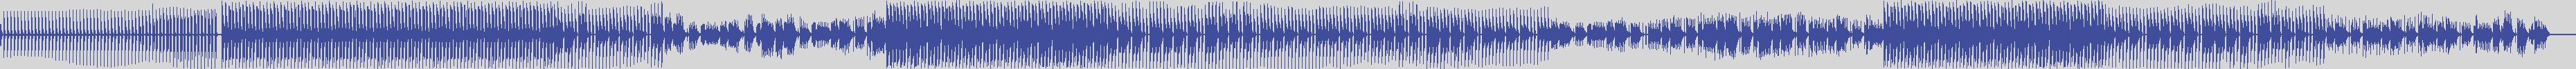 takeshi_recordings [SP2337] Frank K, David Mass - Dress It Up [K Way] audio wave form